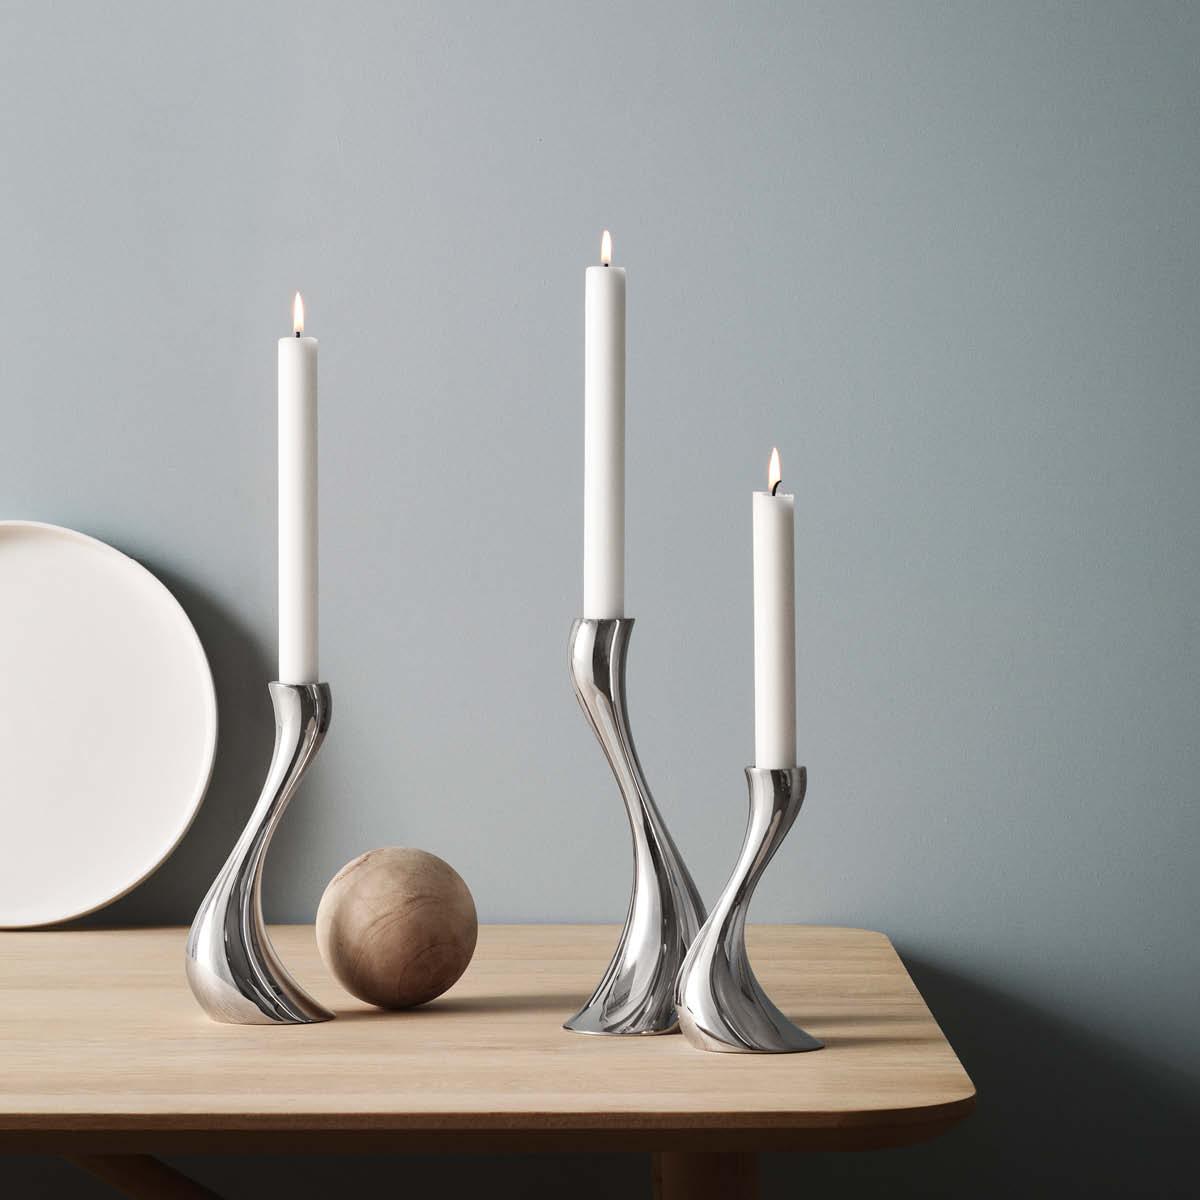 georg jensen skandinavisches design aus d nemark seit 1904. Black Bedroom Furniture Sets. Home Design Ideas